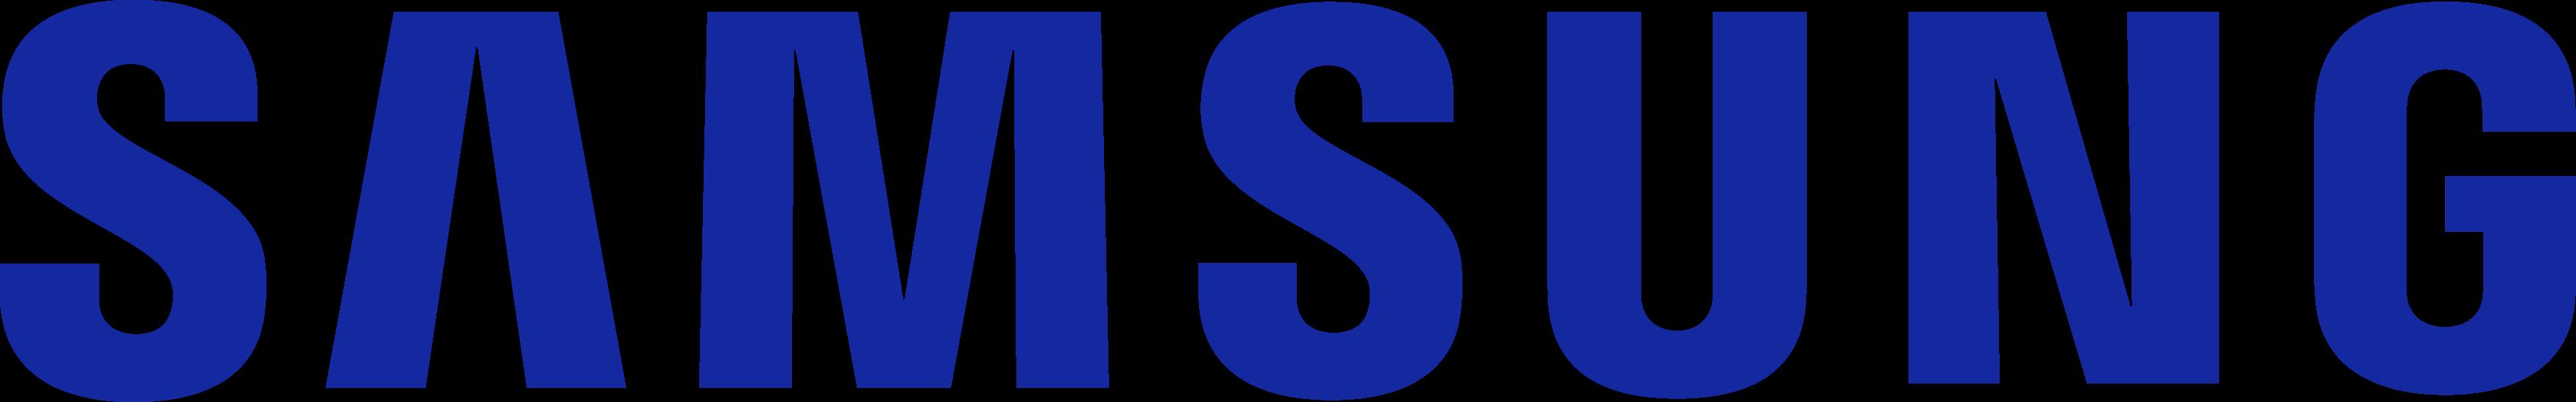 samsung logo 5 - Samsung Logo